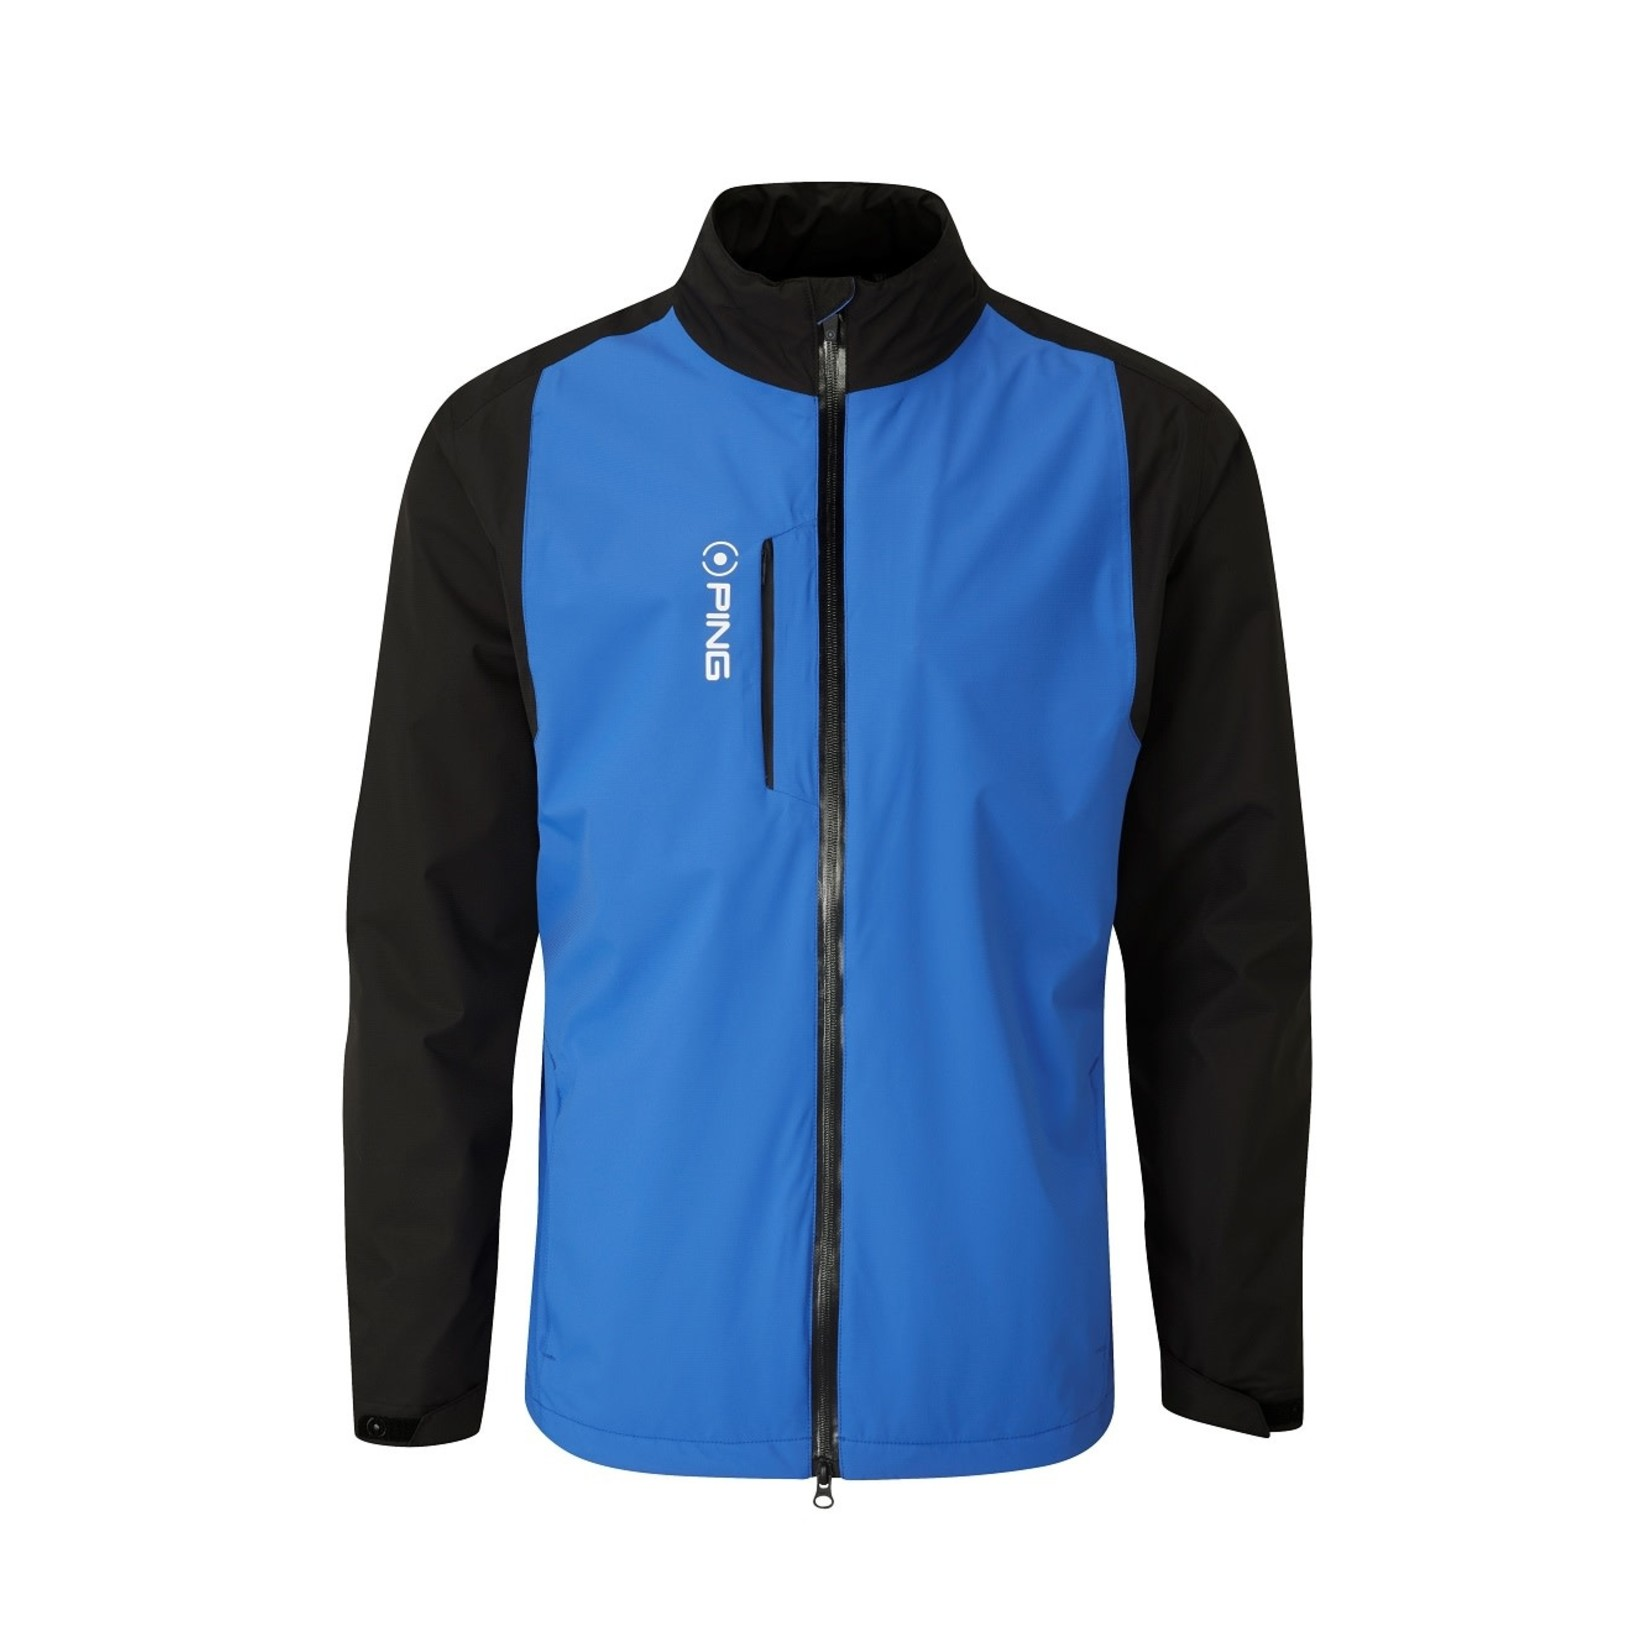 Ping Ping Sensordry Pro Jacket - Delph Blue/Black